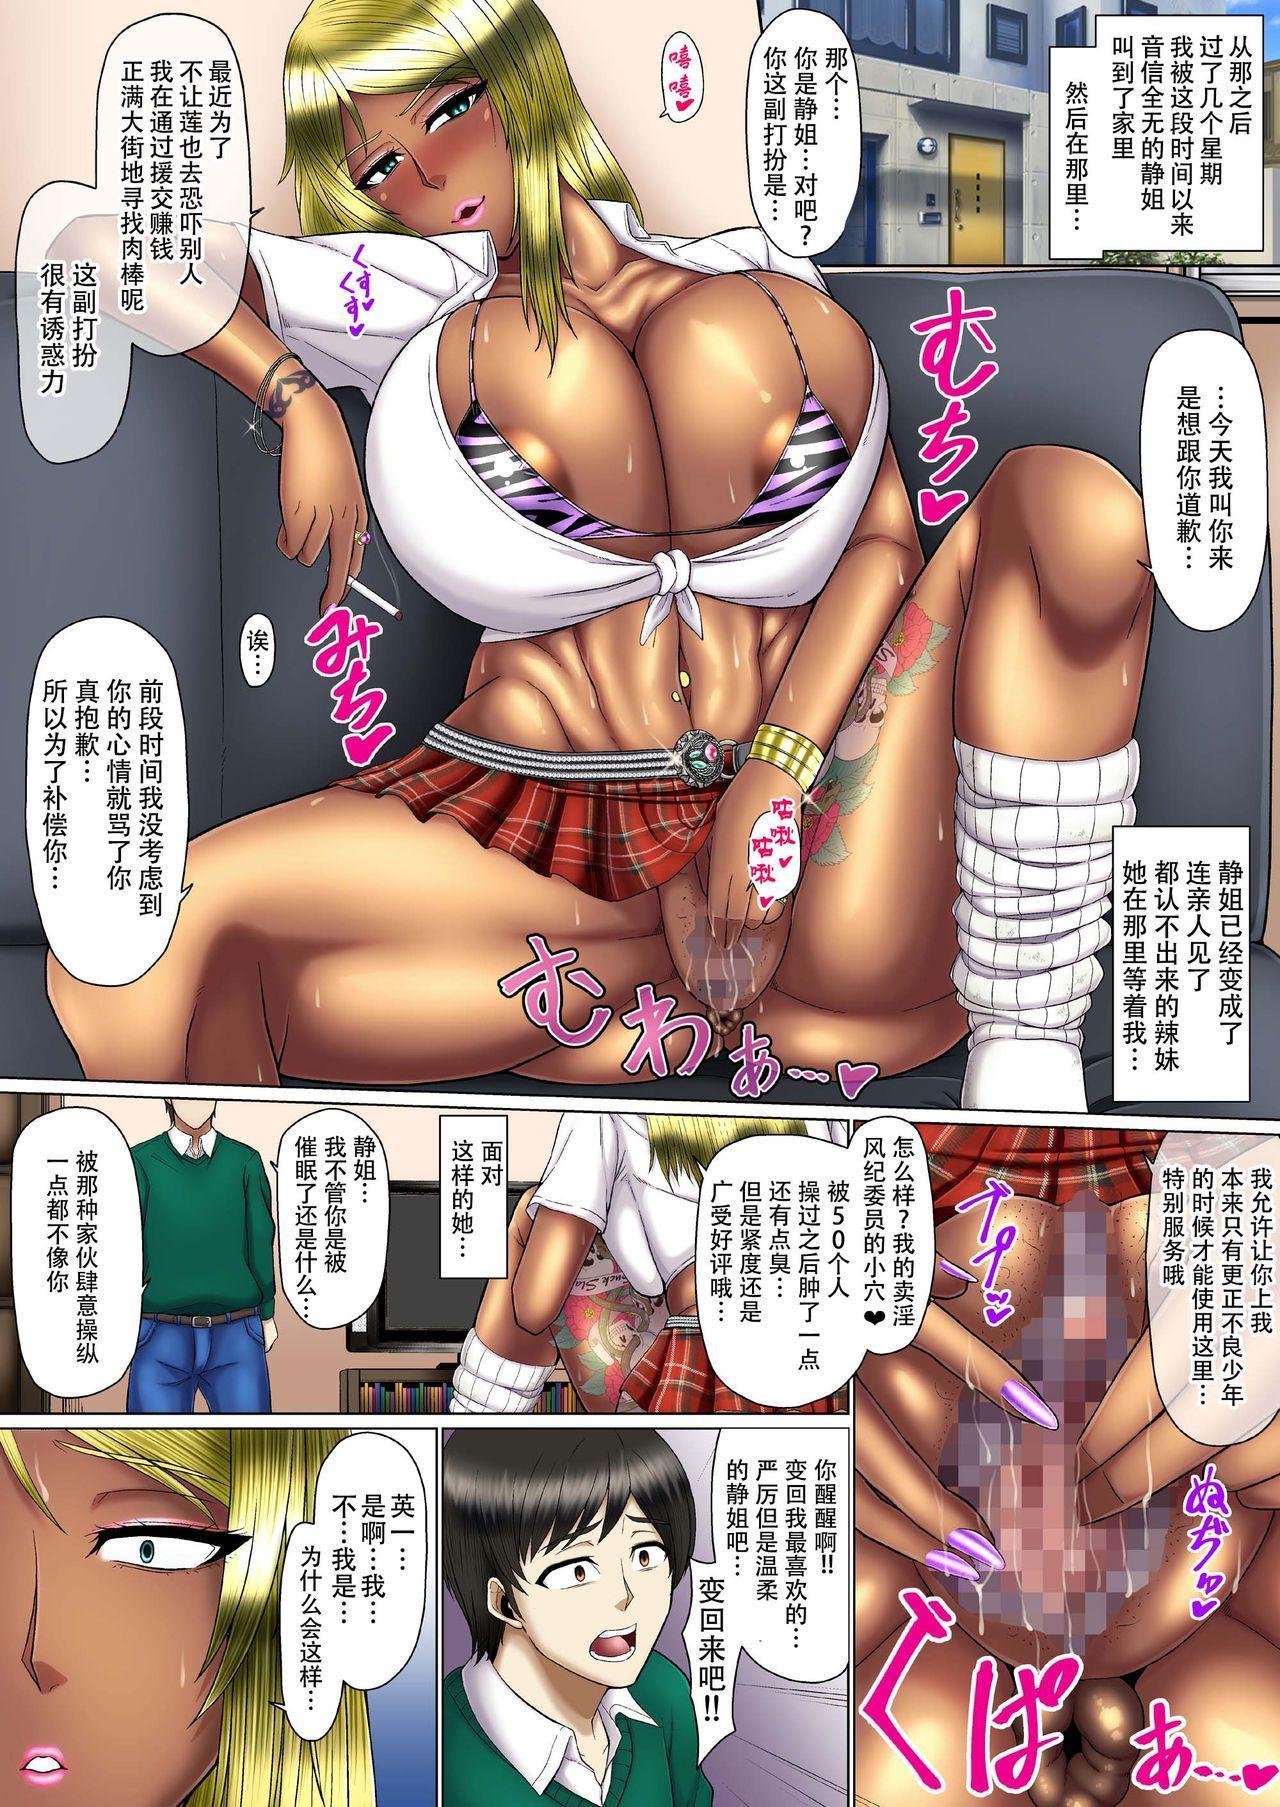 Saimin Netorare Fuuki Iin 11